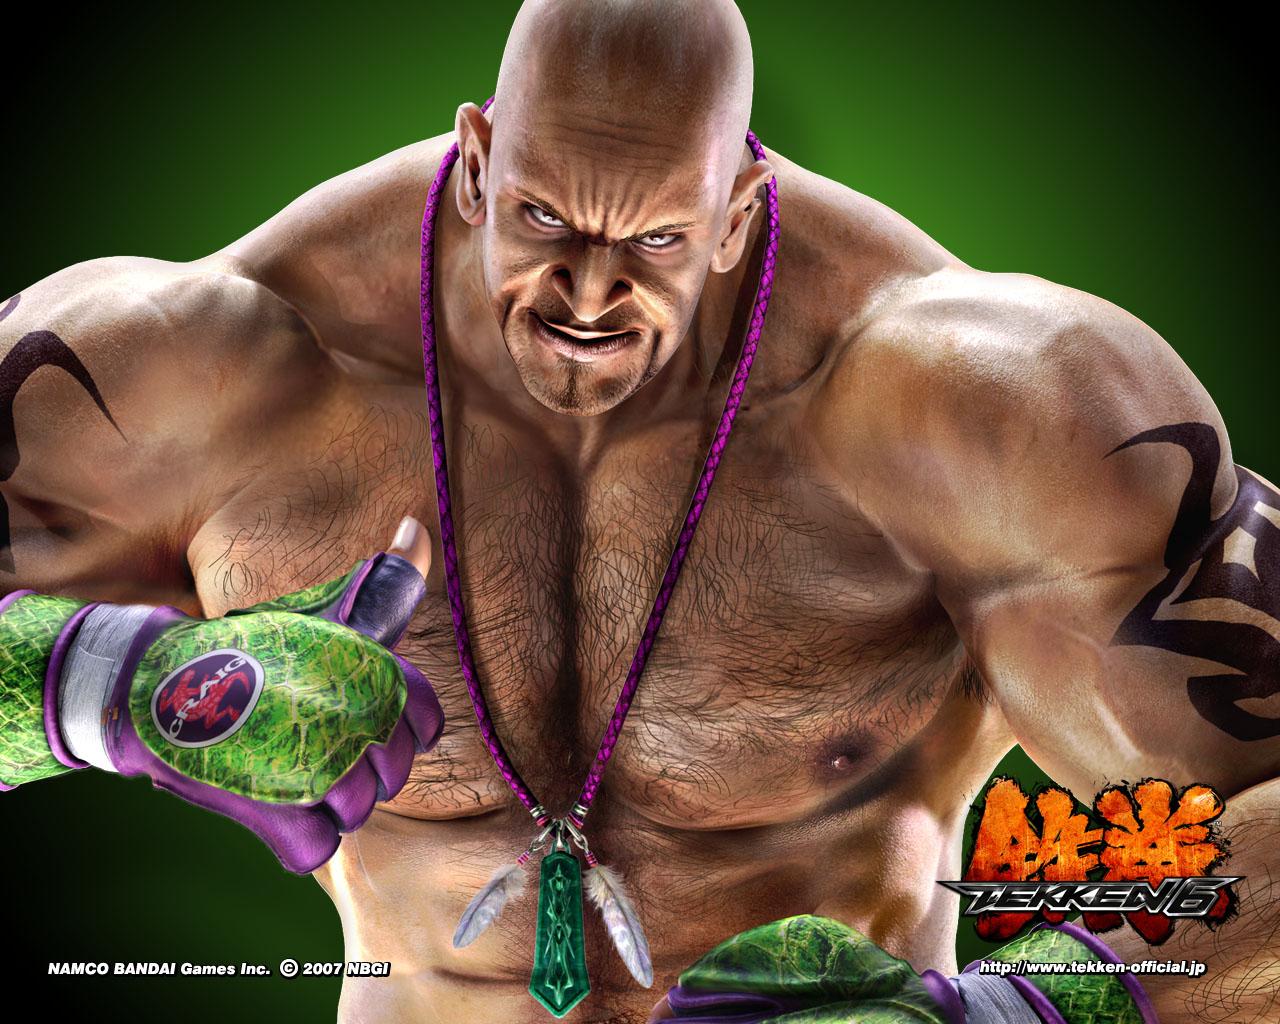 King Tekken Real Face 1280x1024 Wallpaper Teahub Io